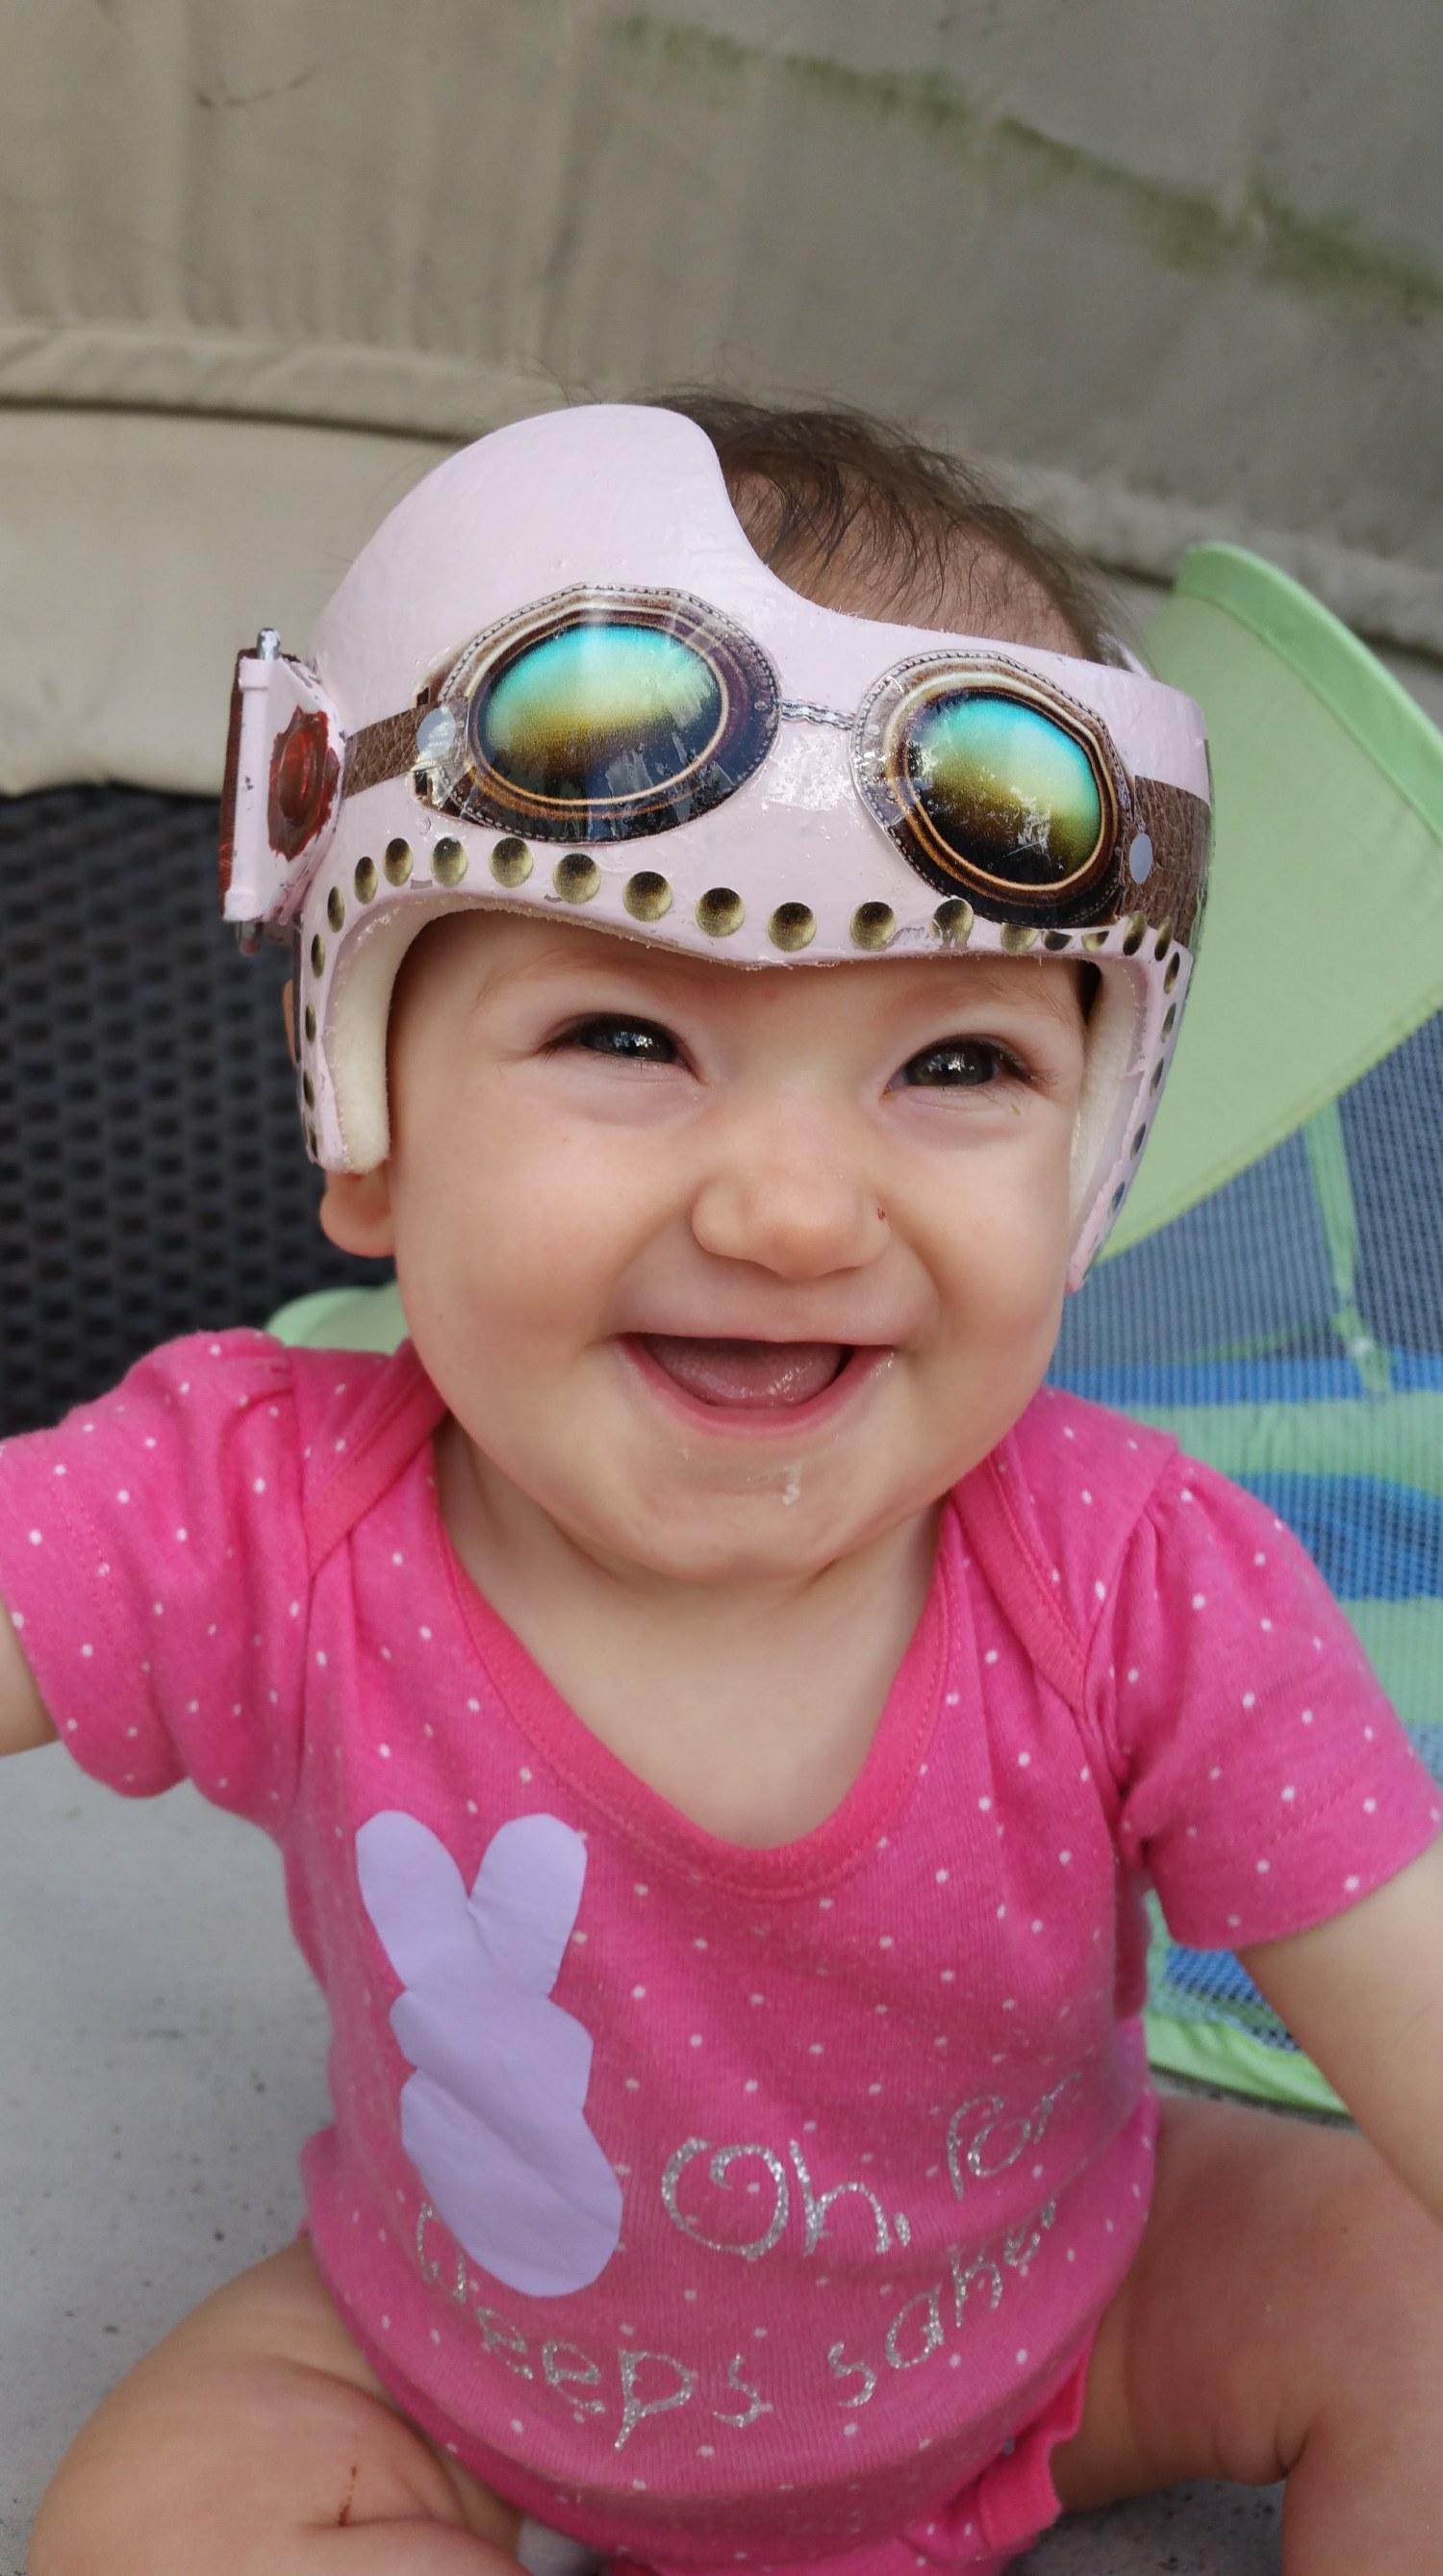 Our Little Helmet Head